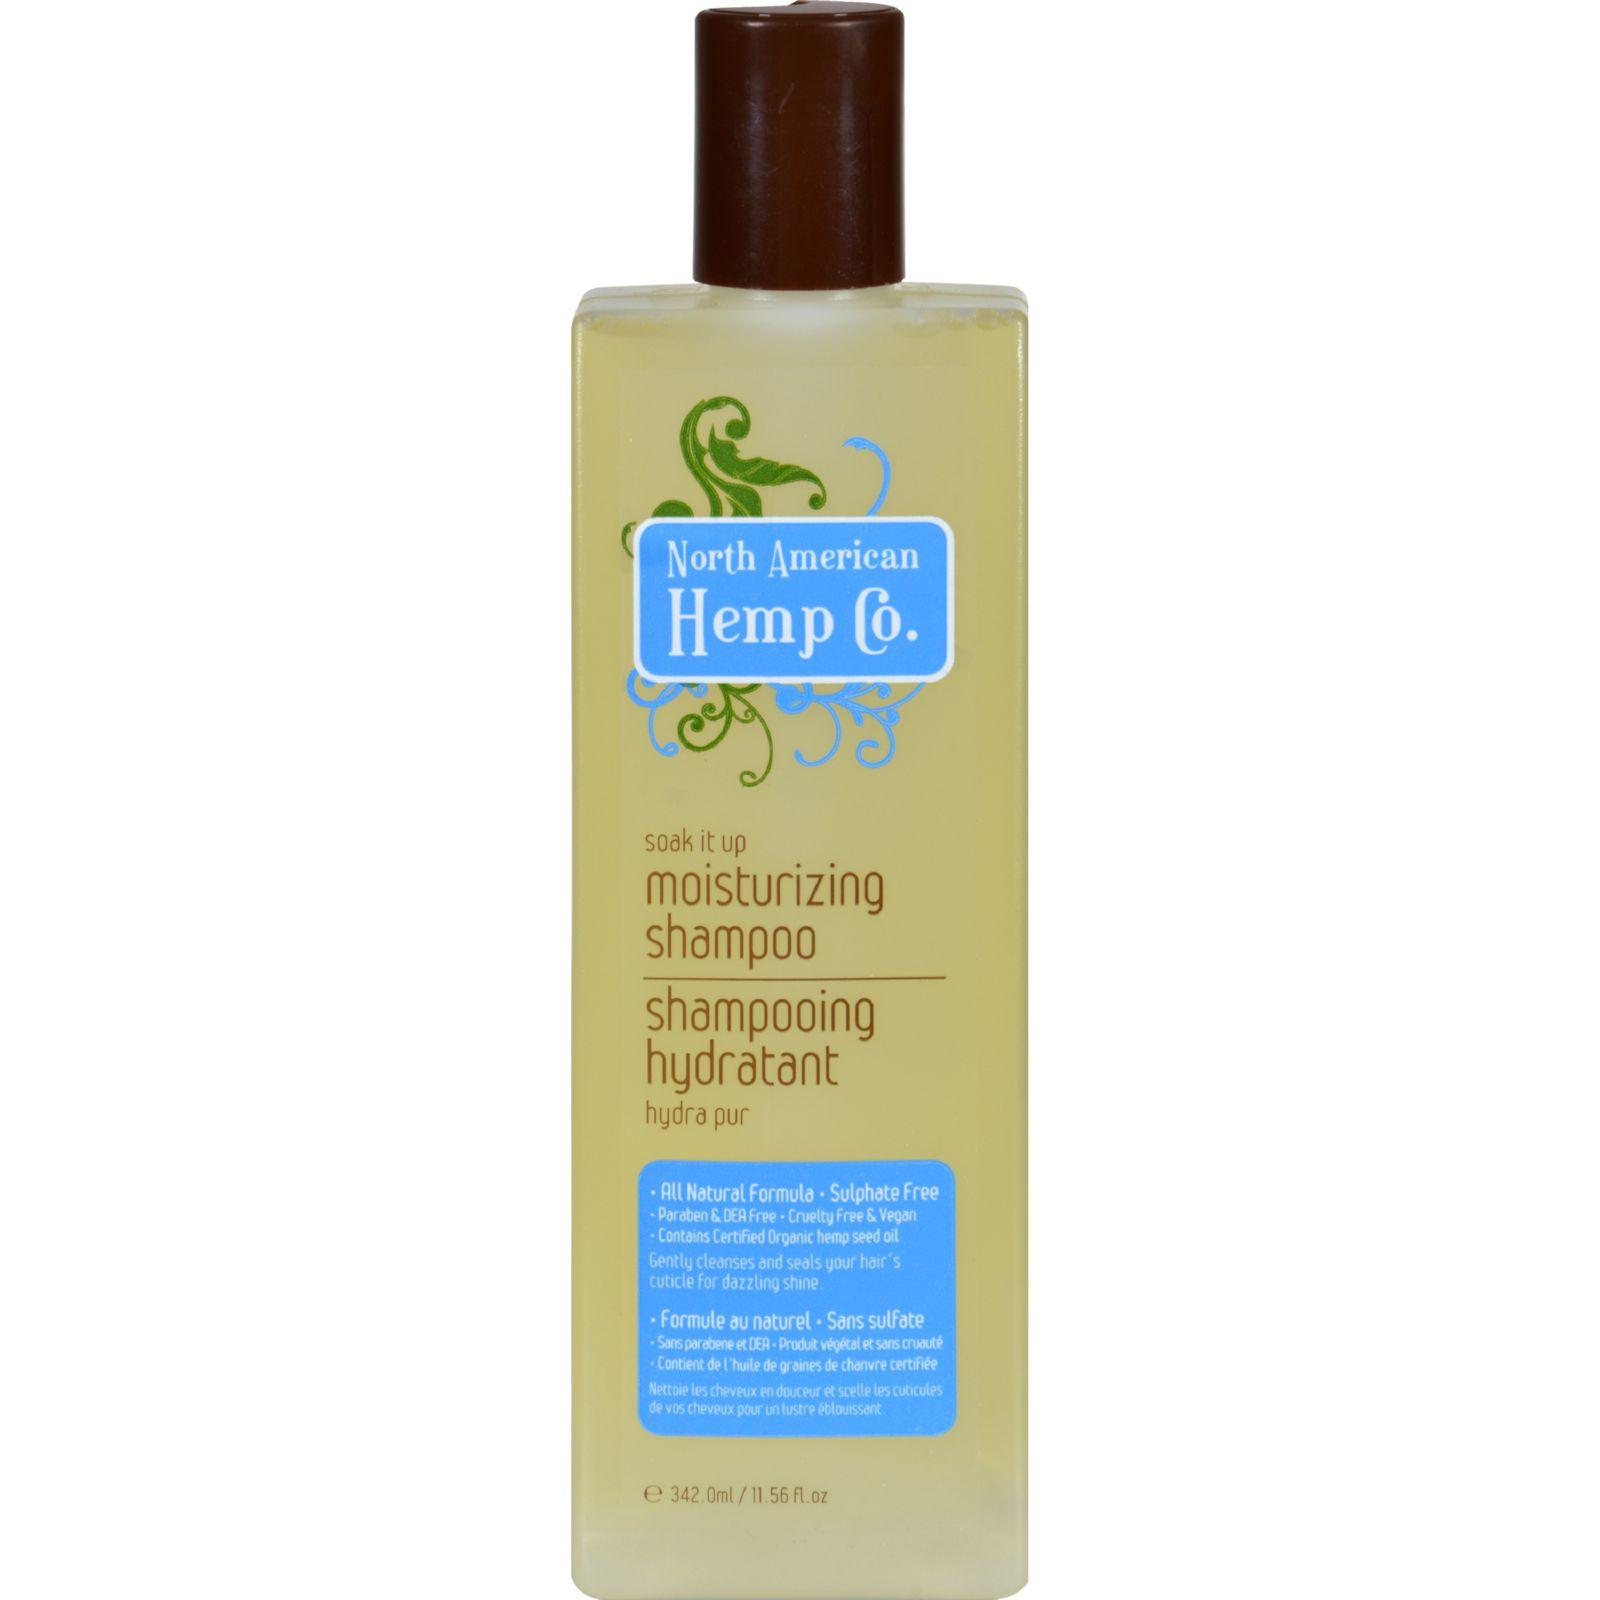 North American Hemp Company Shampoo - Moisturizing - 11.56 fl oz